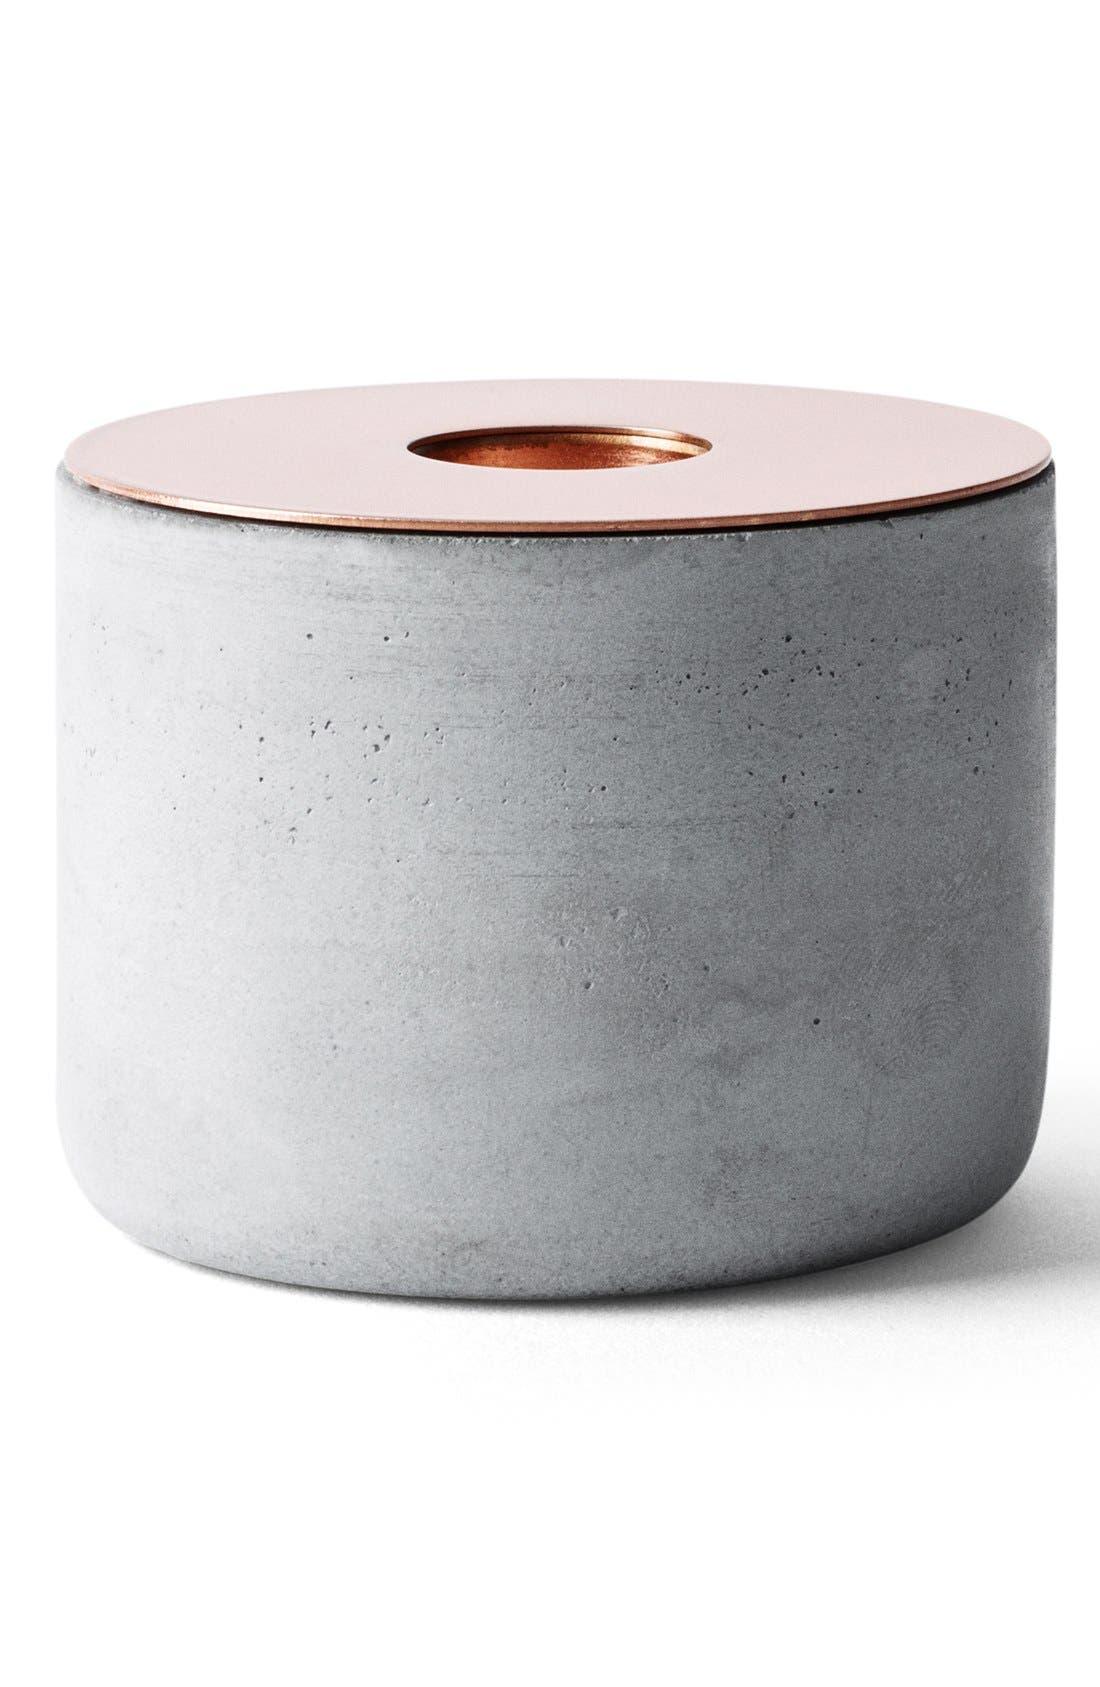 Alternate Image 1 Selected - MENU 'Chunk of Concrete' Candlestick Holder